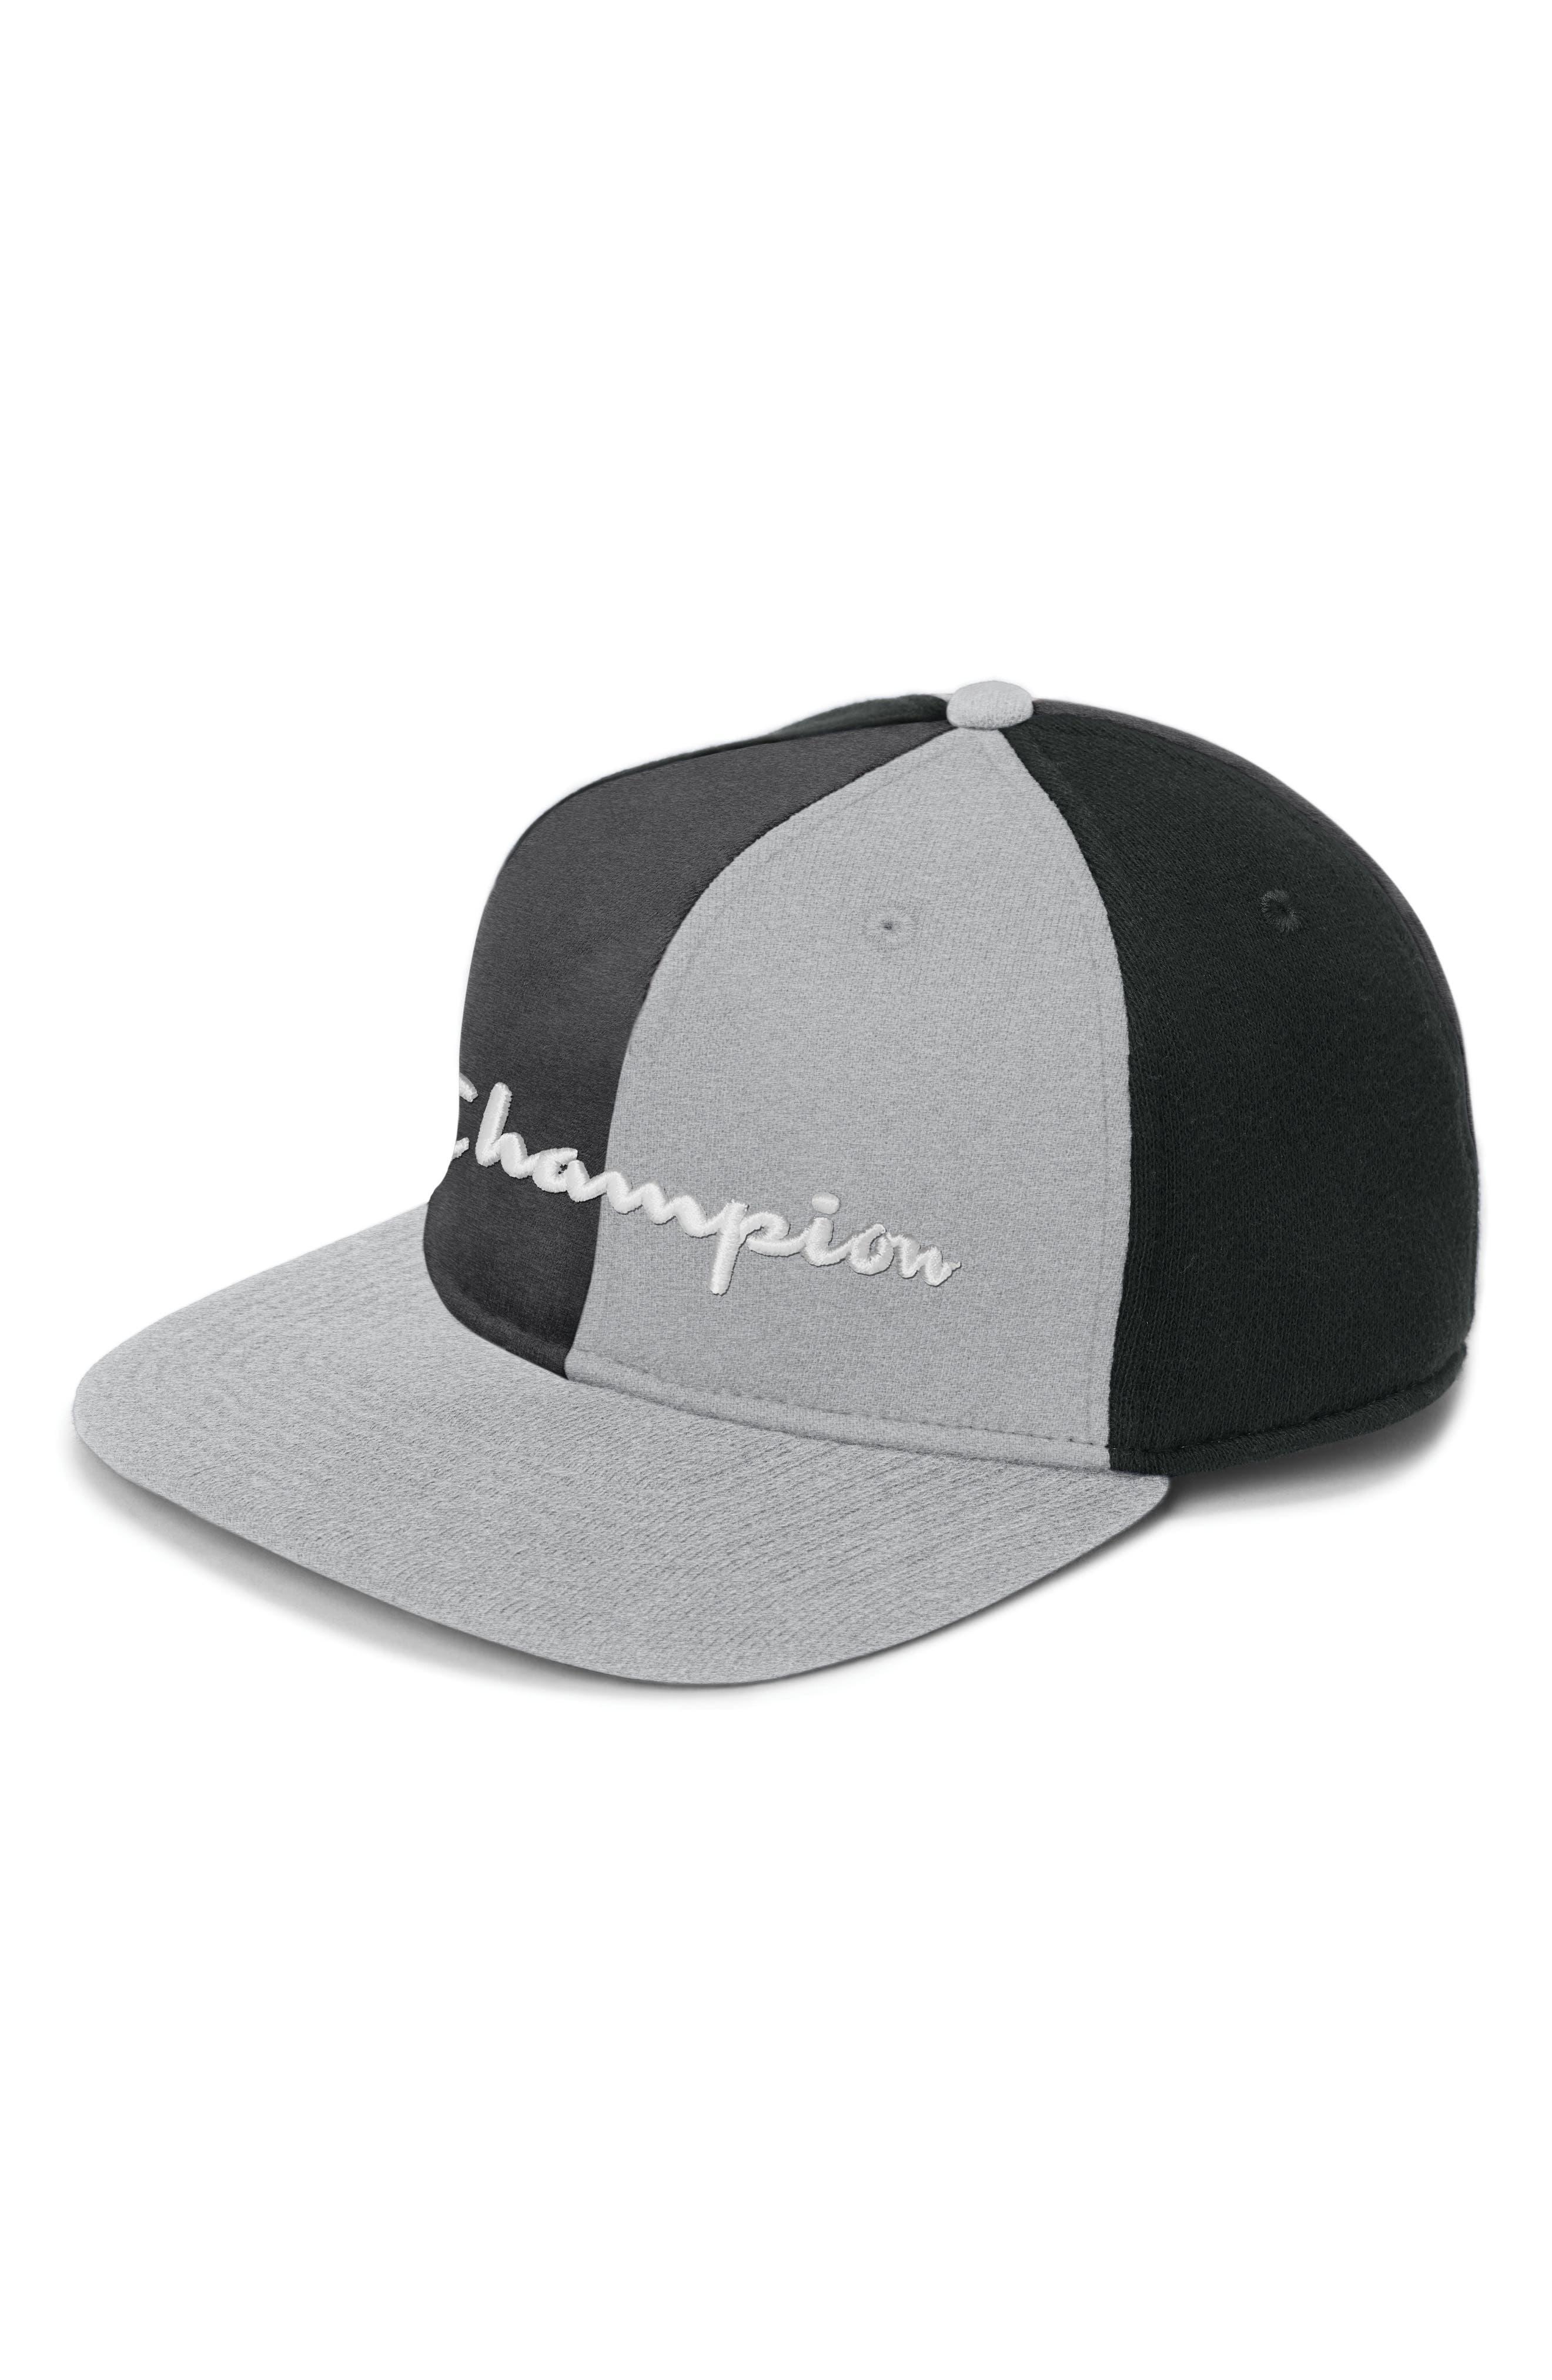 Colorblock Baseball Cap,                         Main,                         color, 020